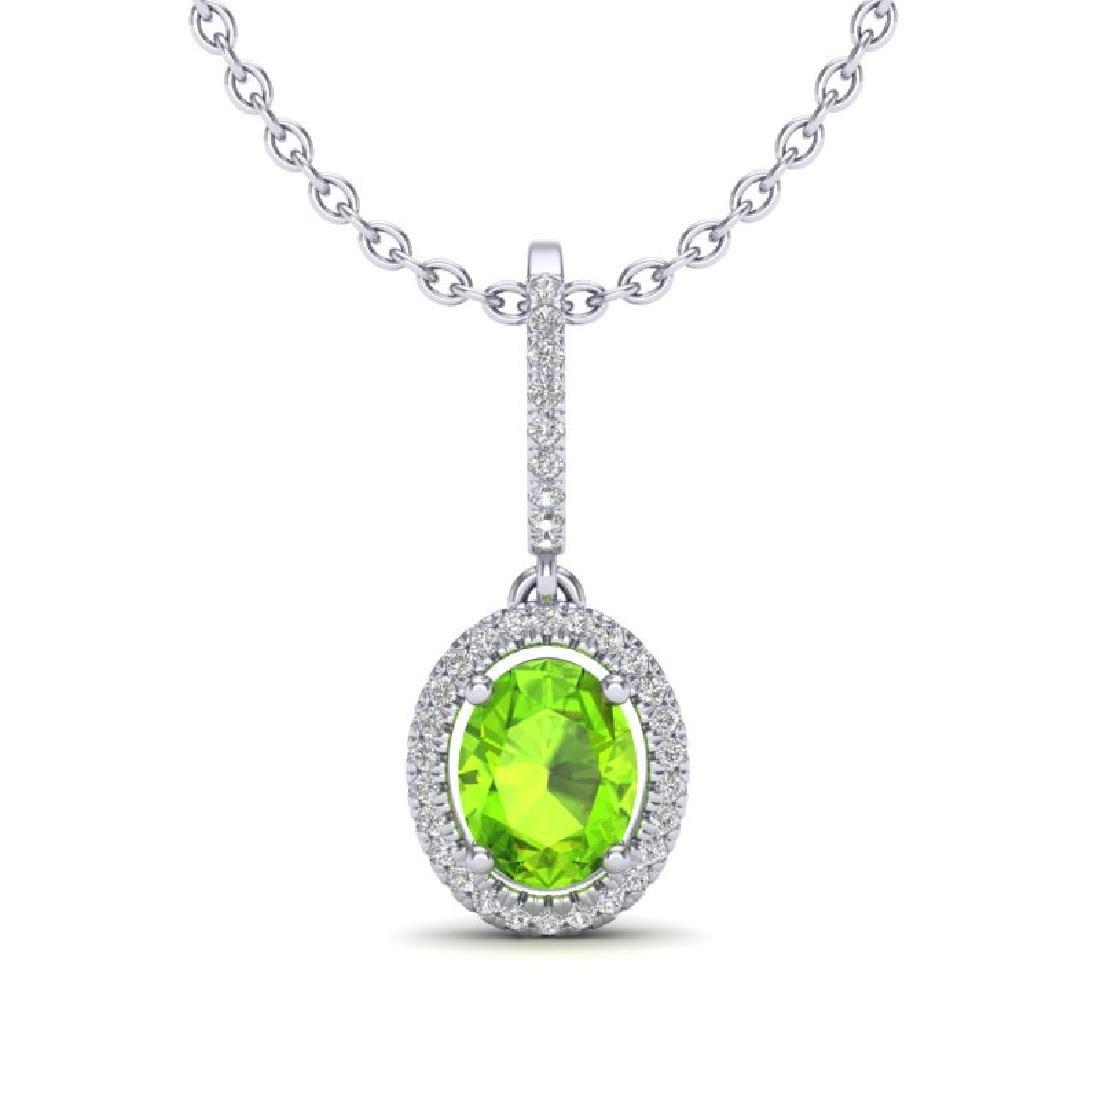 2 CTW Peridot & Micro Pave VS/SI Diamond Necklace